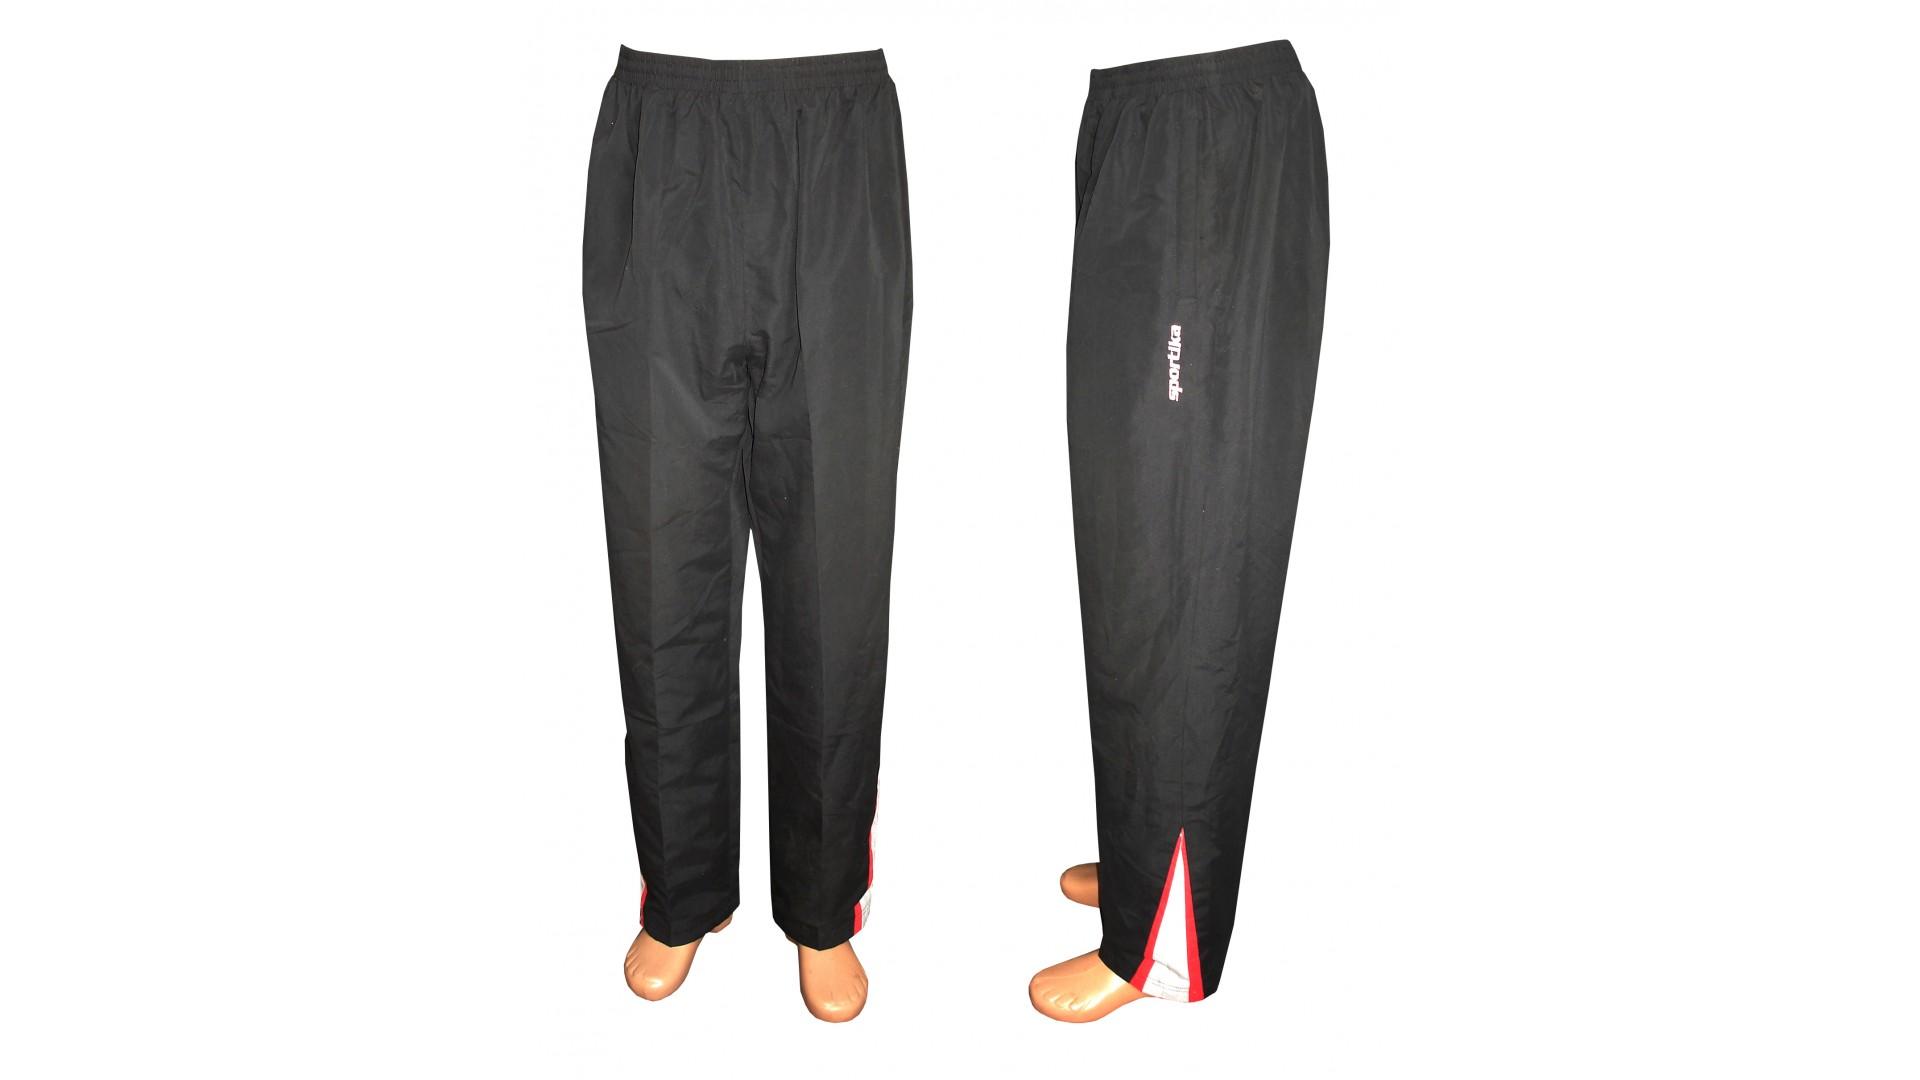 Спортивный костюм Sportika брюки вид спереди и сзади